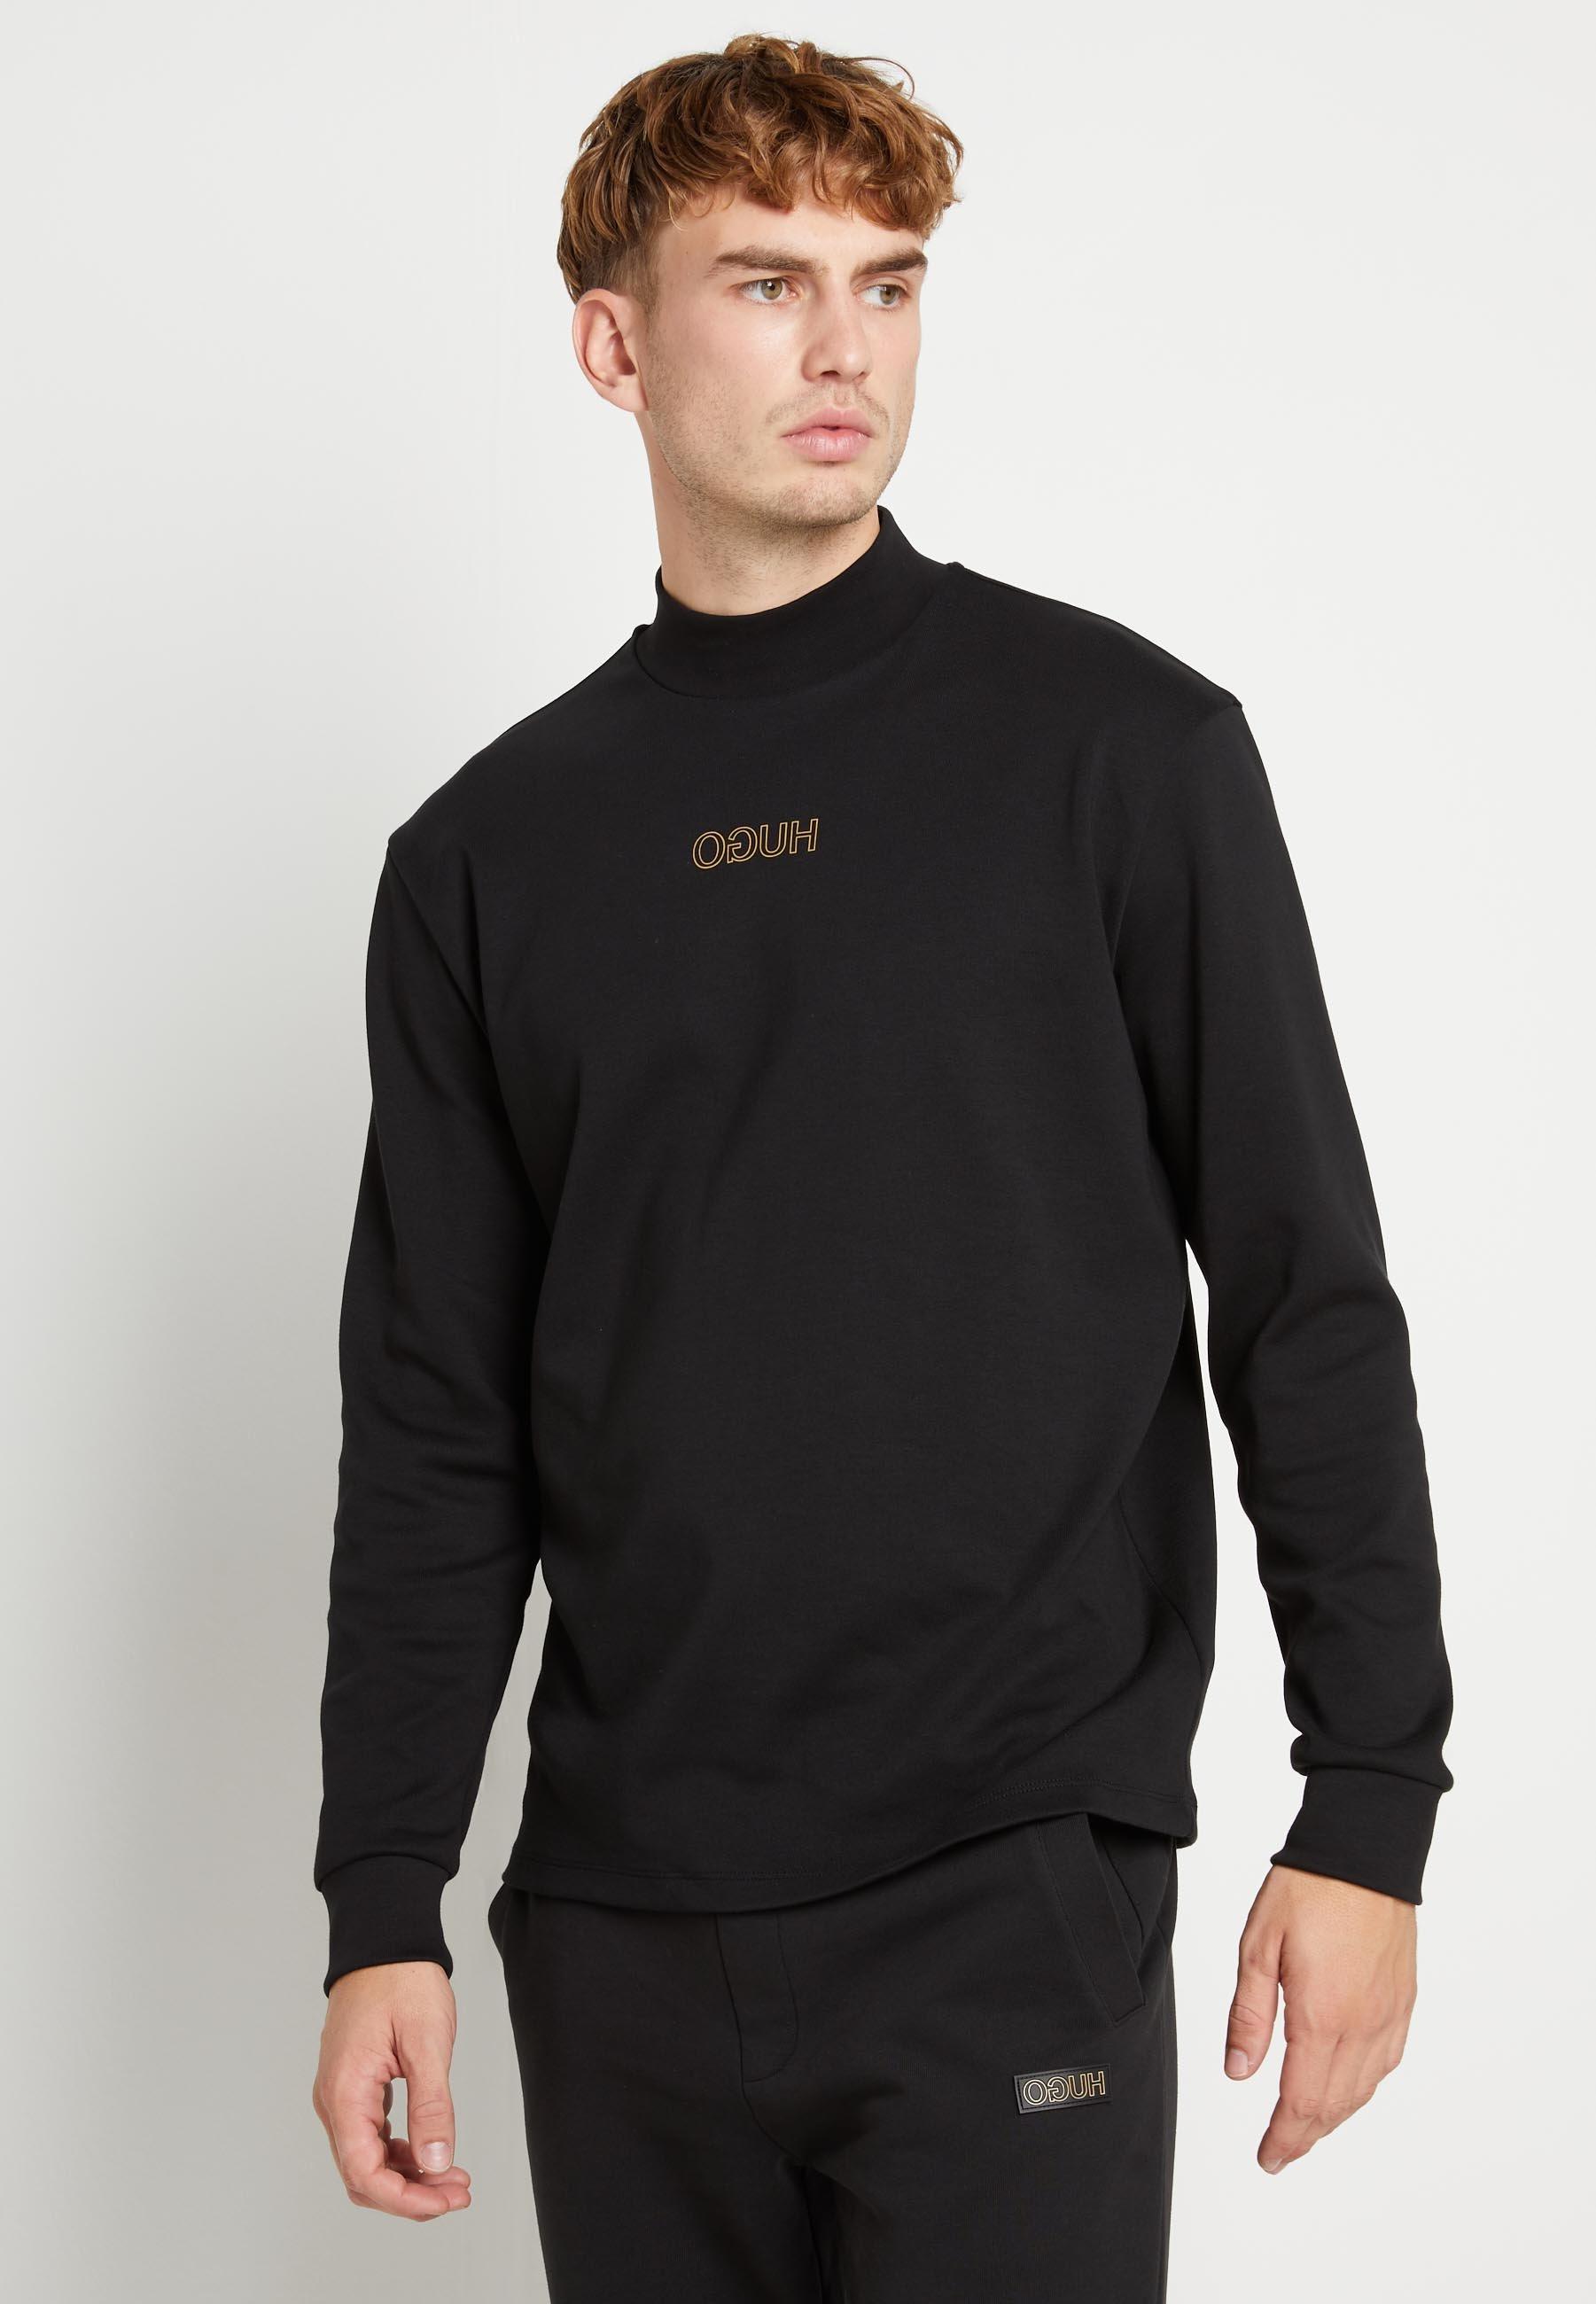 Homme DISAMU - T-shirt à manches longues